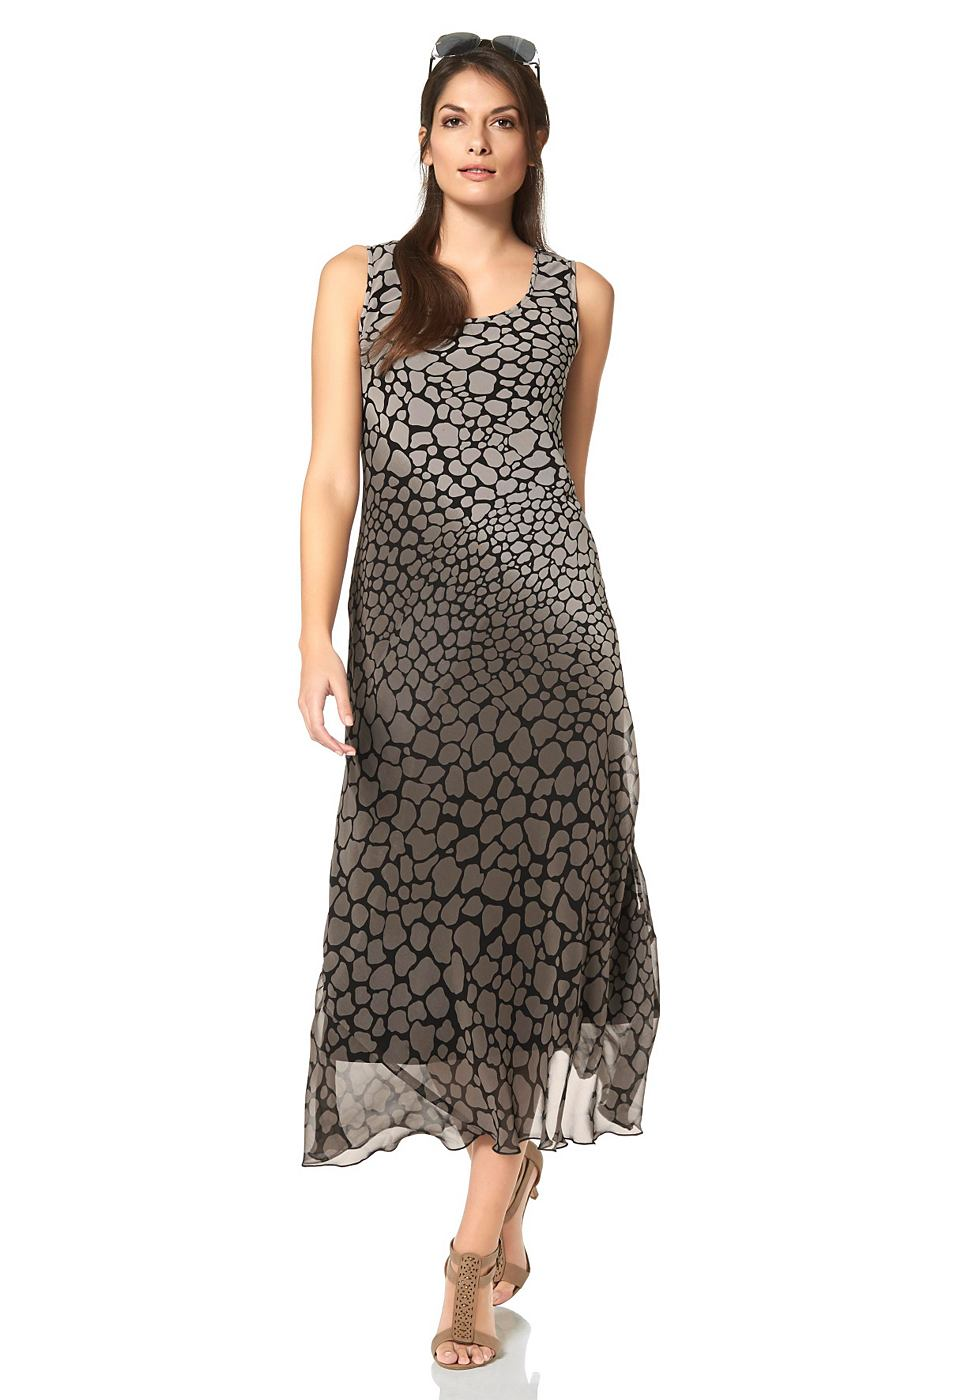 Vivance Collection chiffon-jurk met allover-animal-print beige